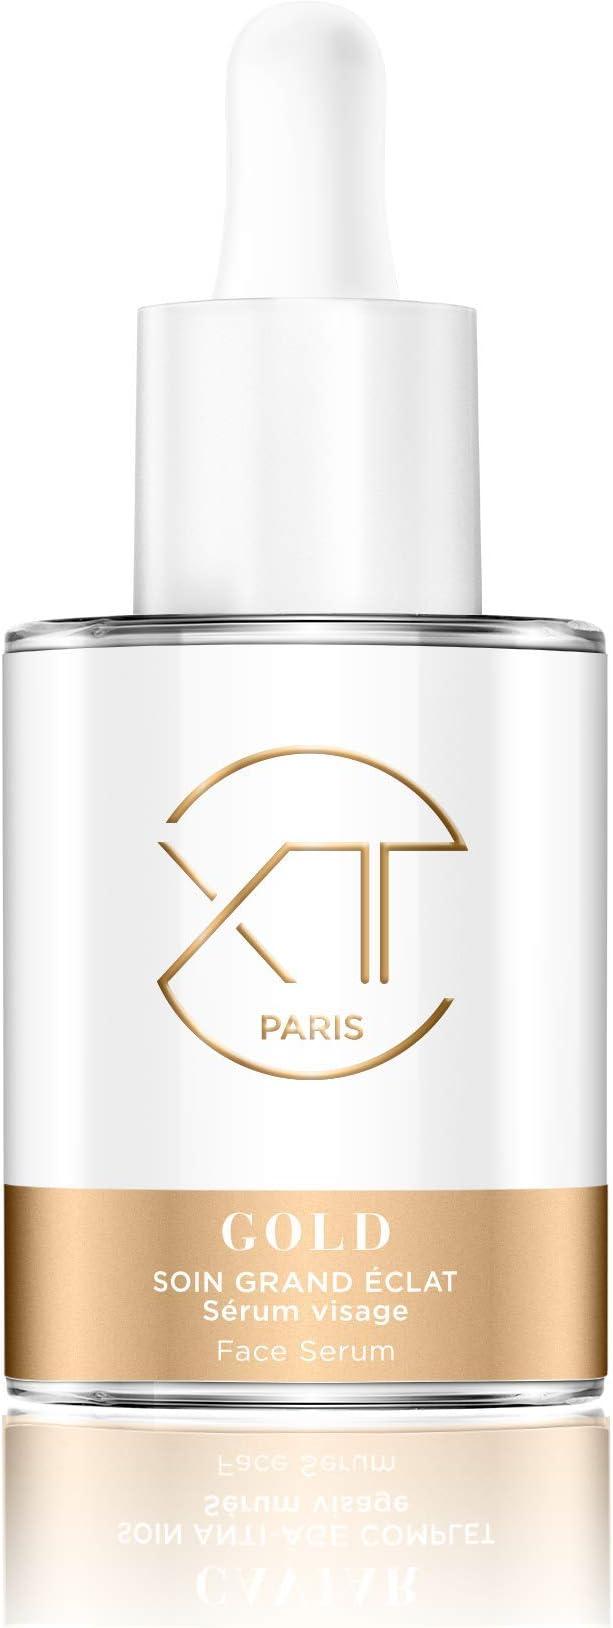 XT PARIS - Colección XT GOLD - Suero facial luminosidad ...